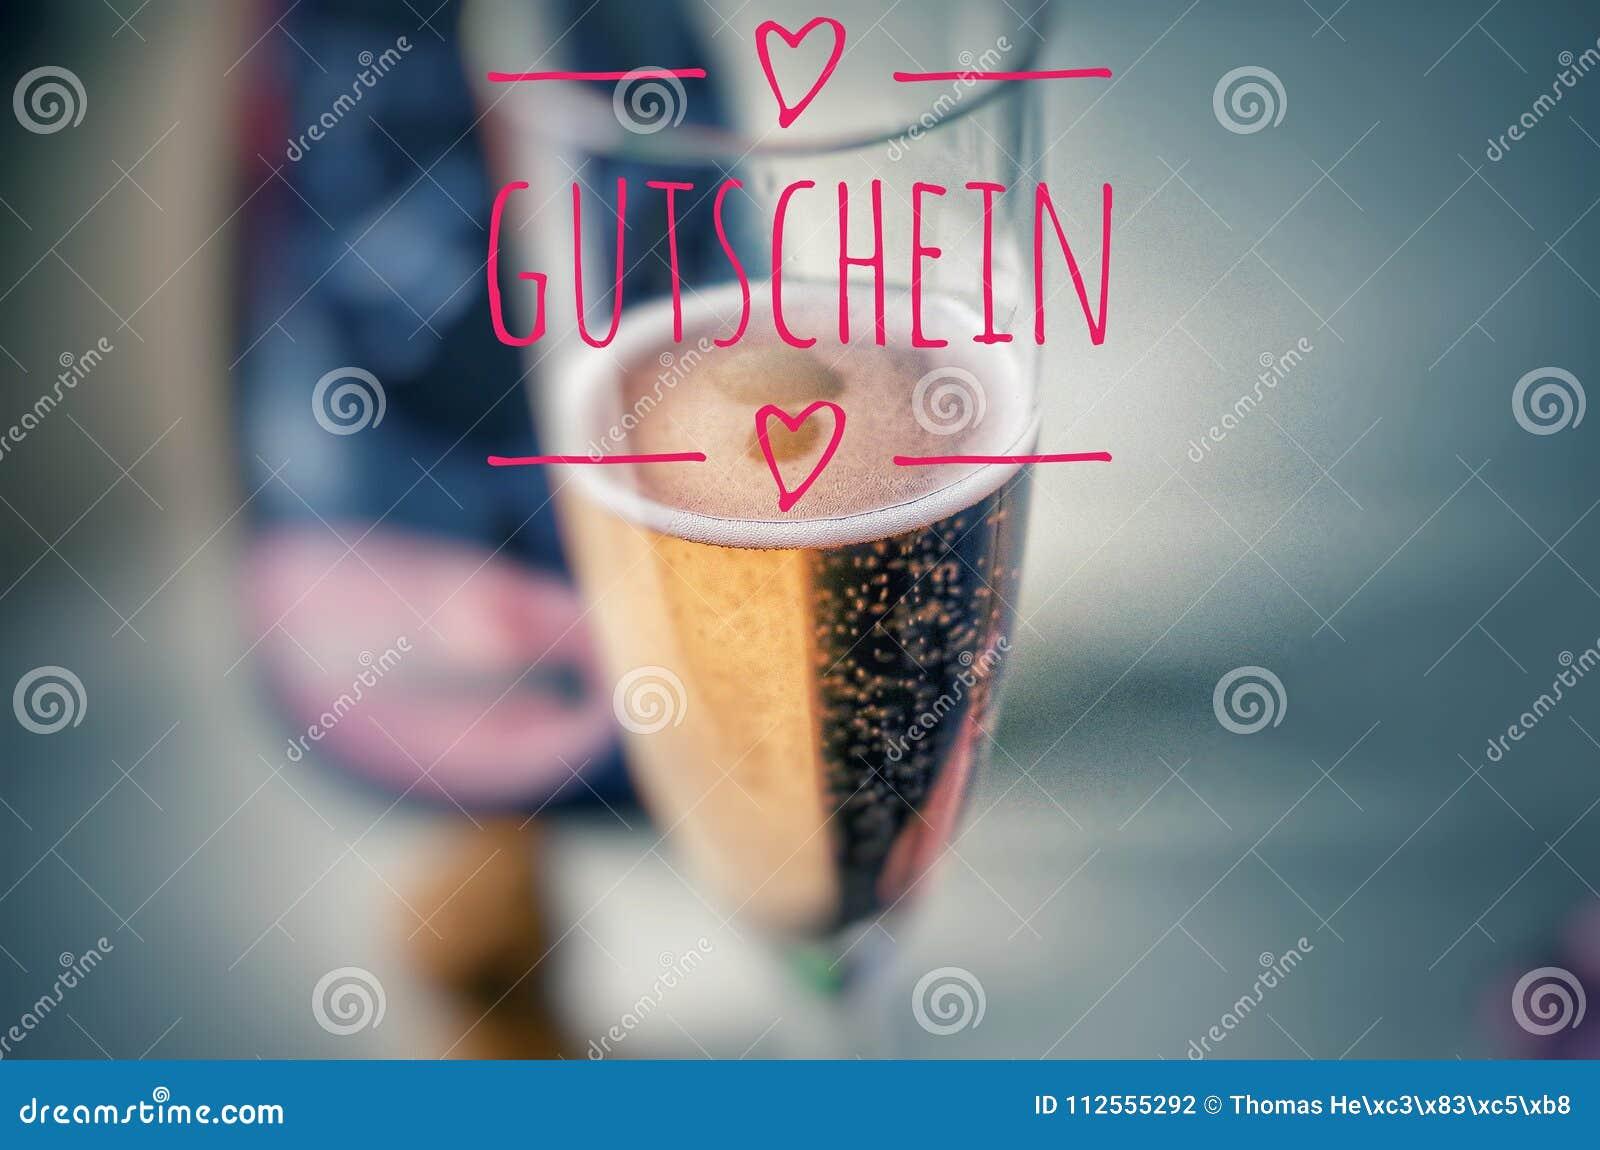 Champagne-glas met edele champagne en inschrijving in roze op Duitse Gutschein, in Engelse coupon, bon, giftkaart